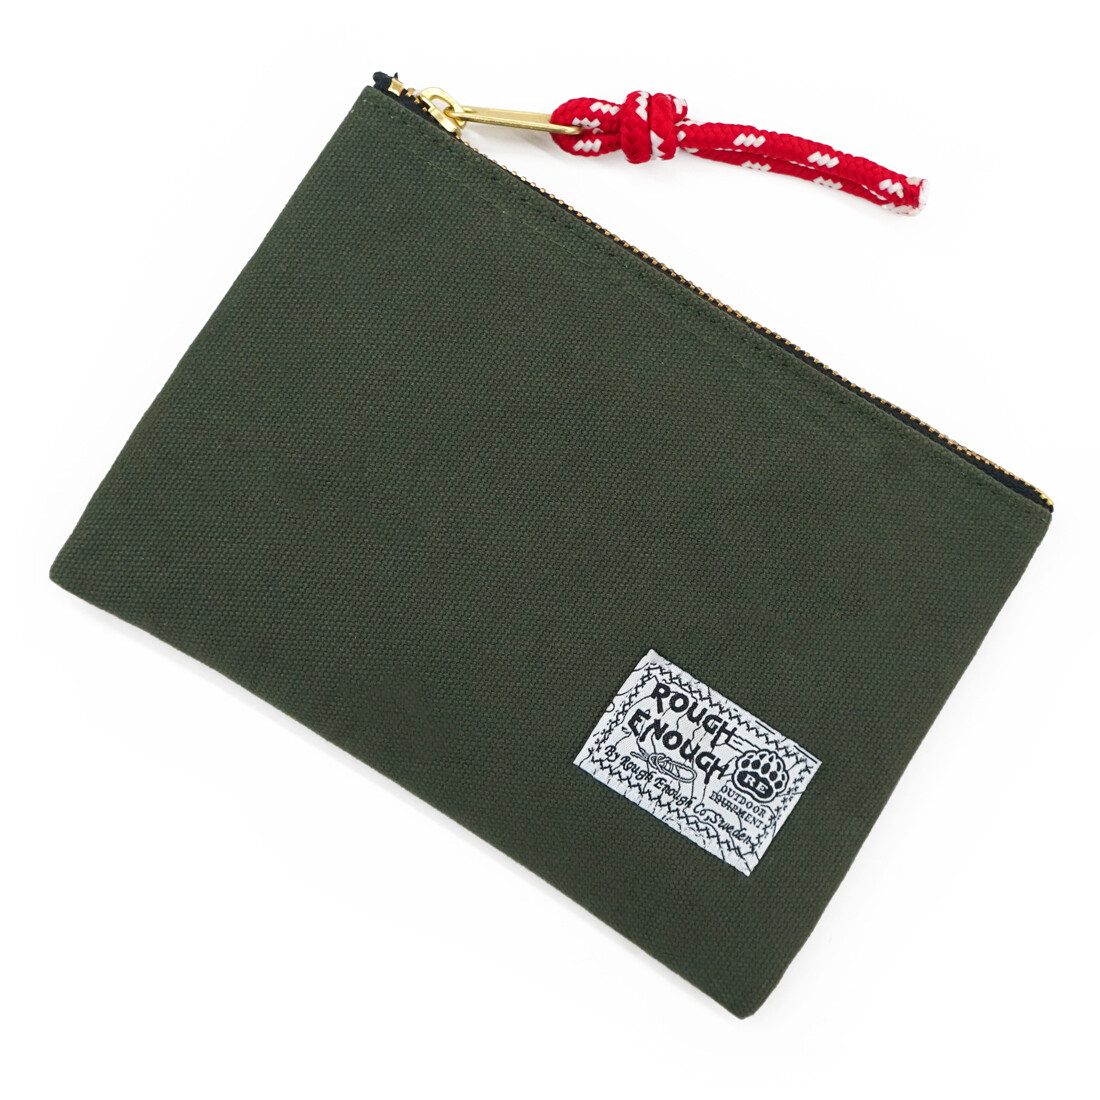 RE8289 Canvas Zipper EDC Pouch Wallet Purse Organizer Insert Bag